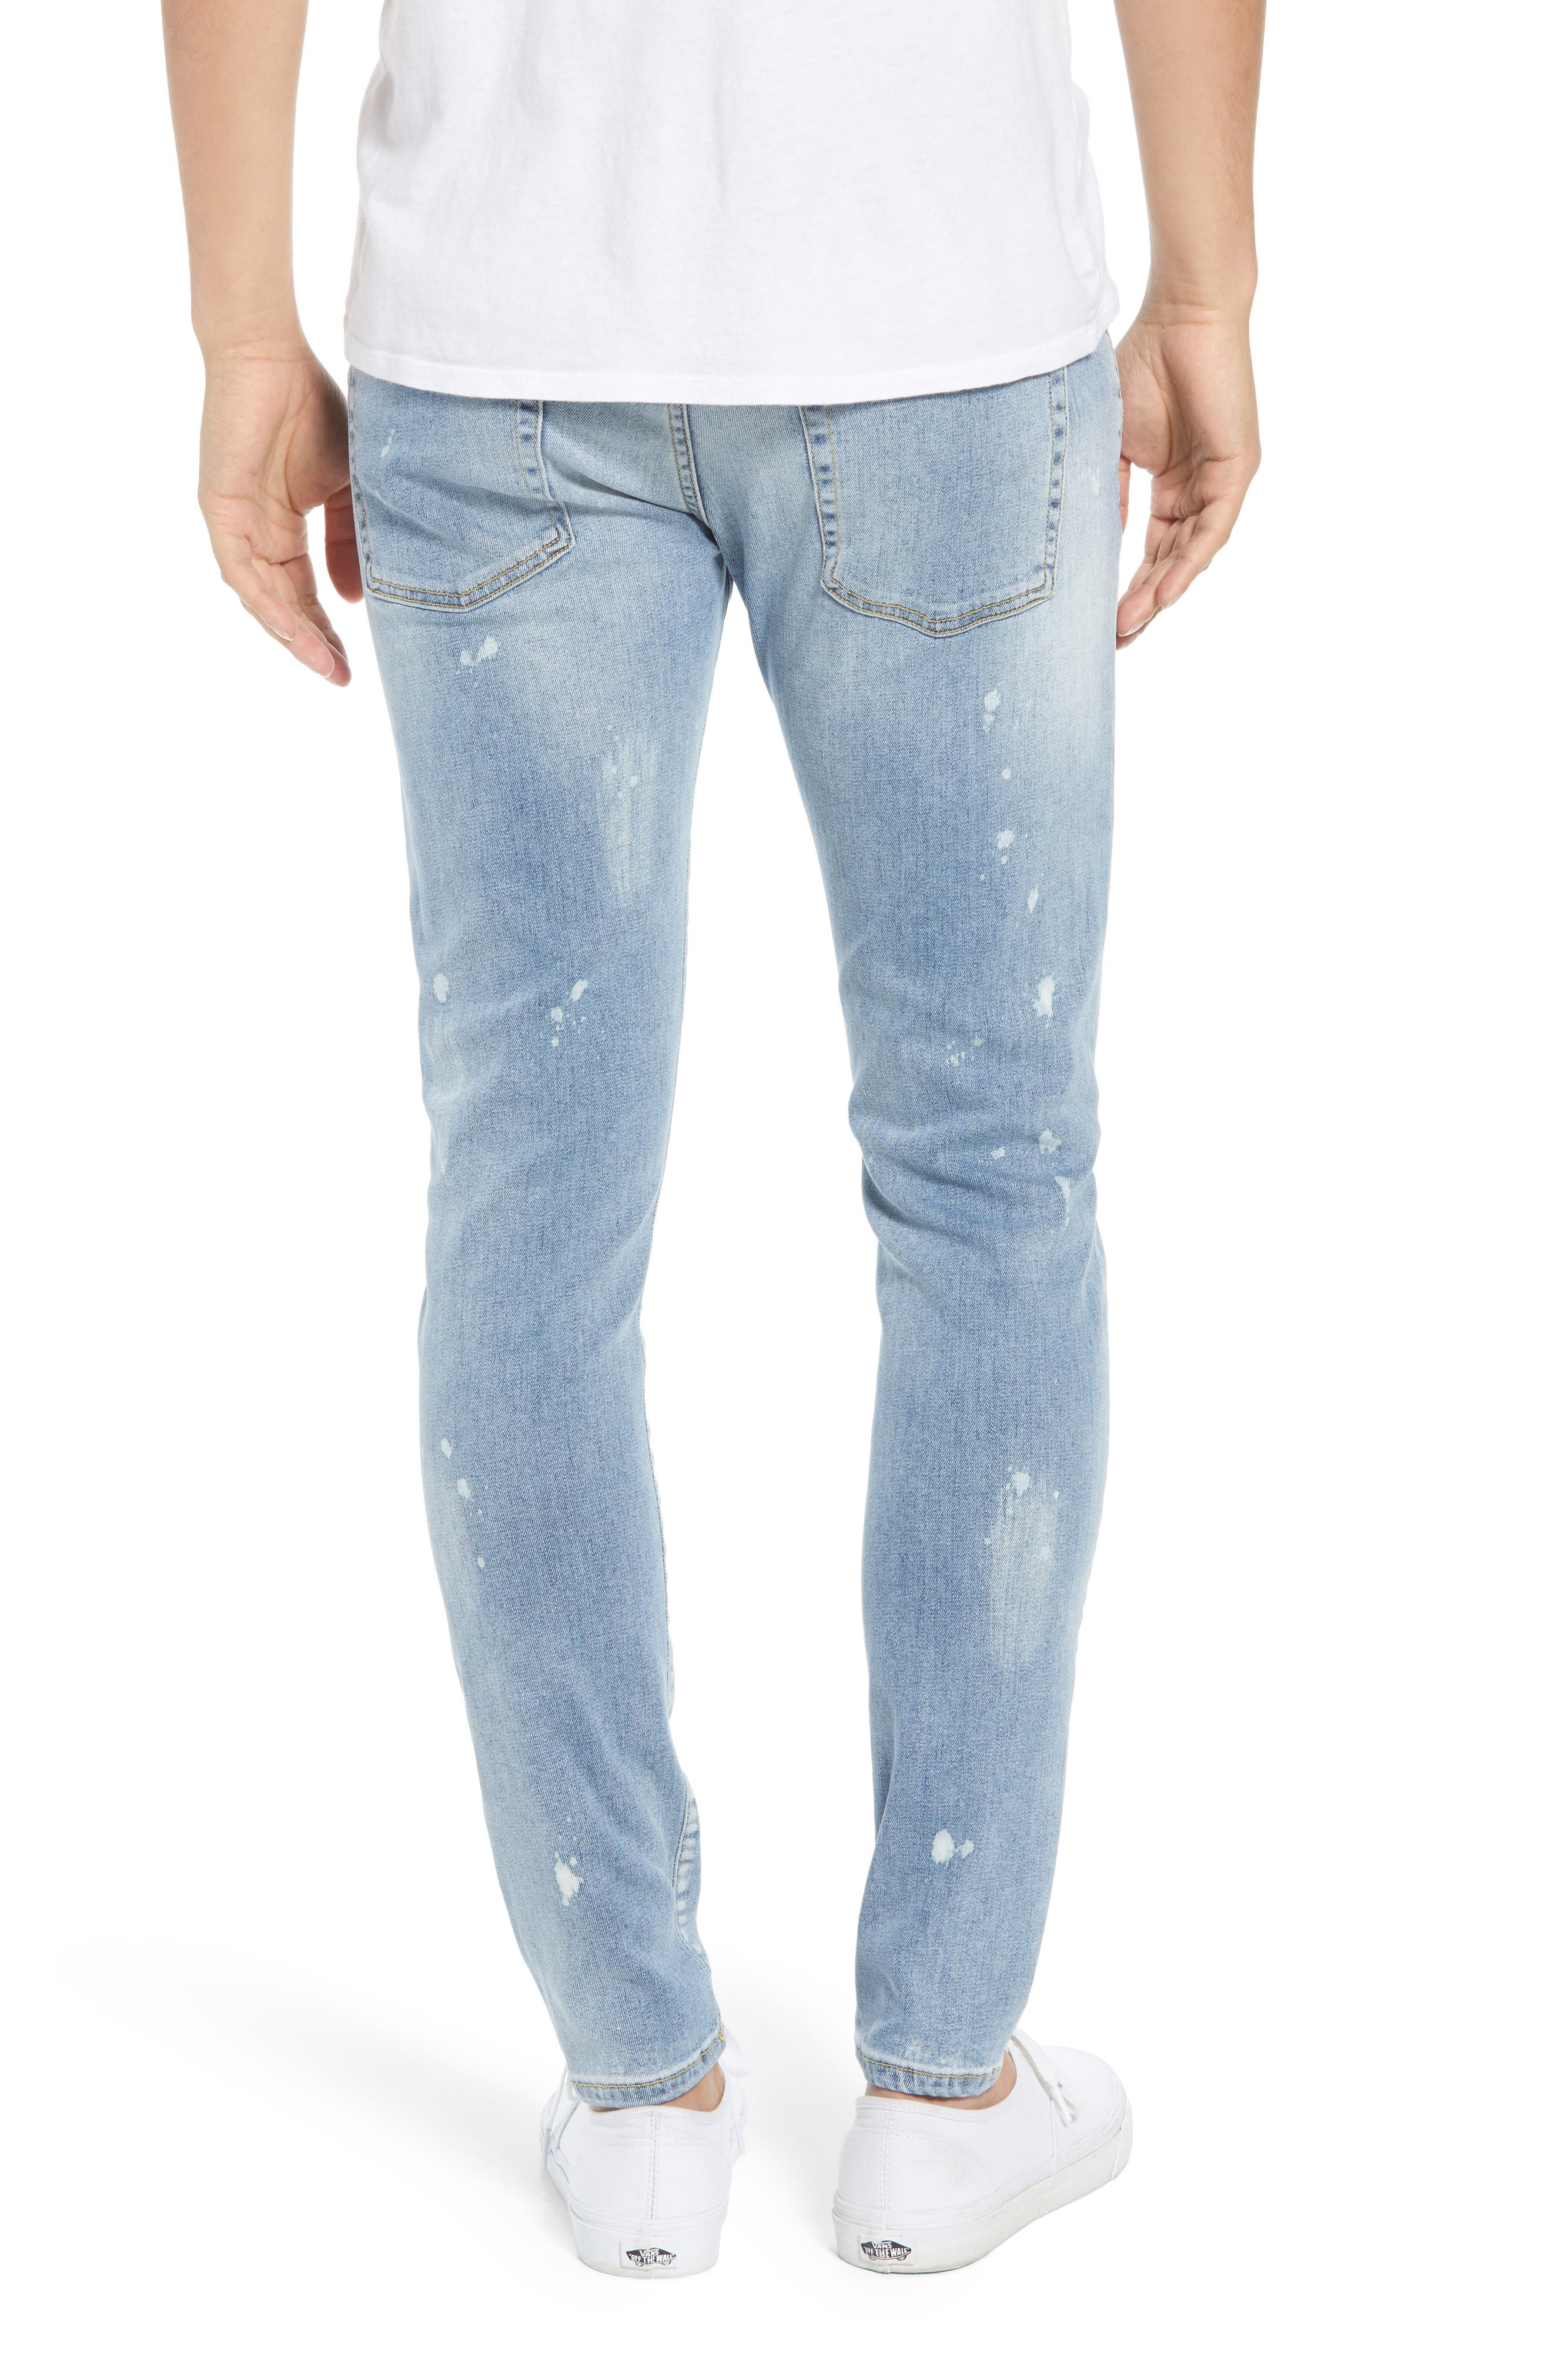 Destroyer Ripped Slim Fit Jeans,                             Alternate thumbnail 2, color,                             BLUE